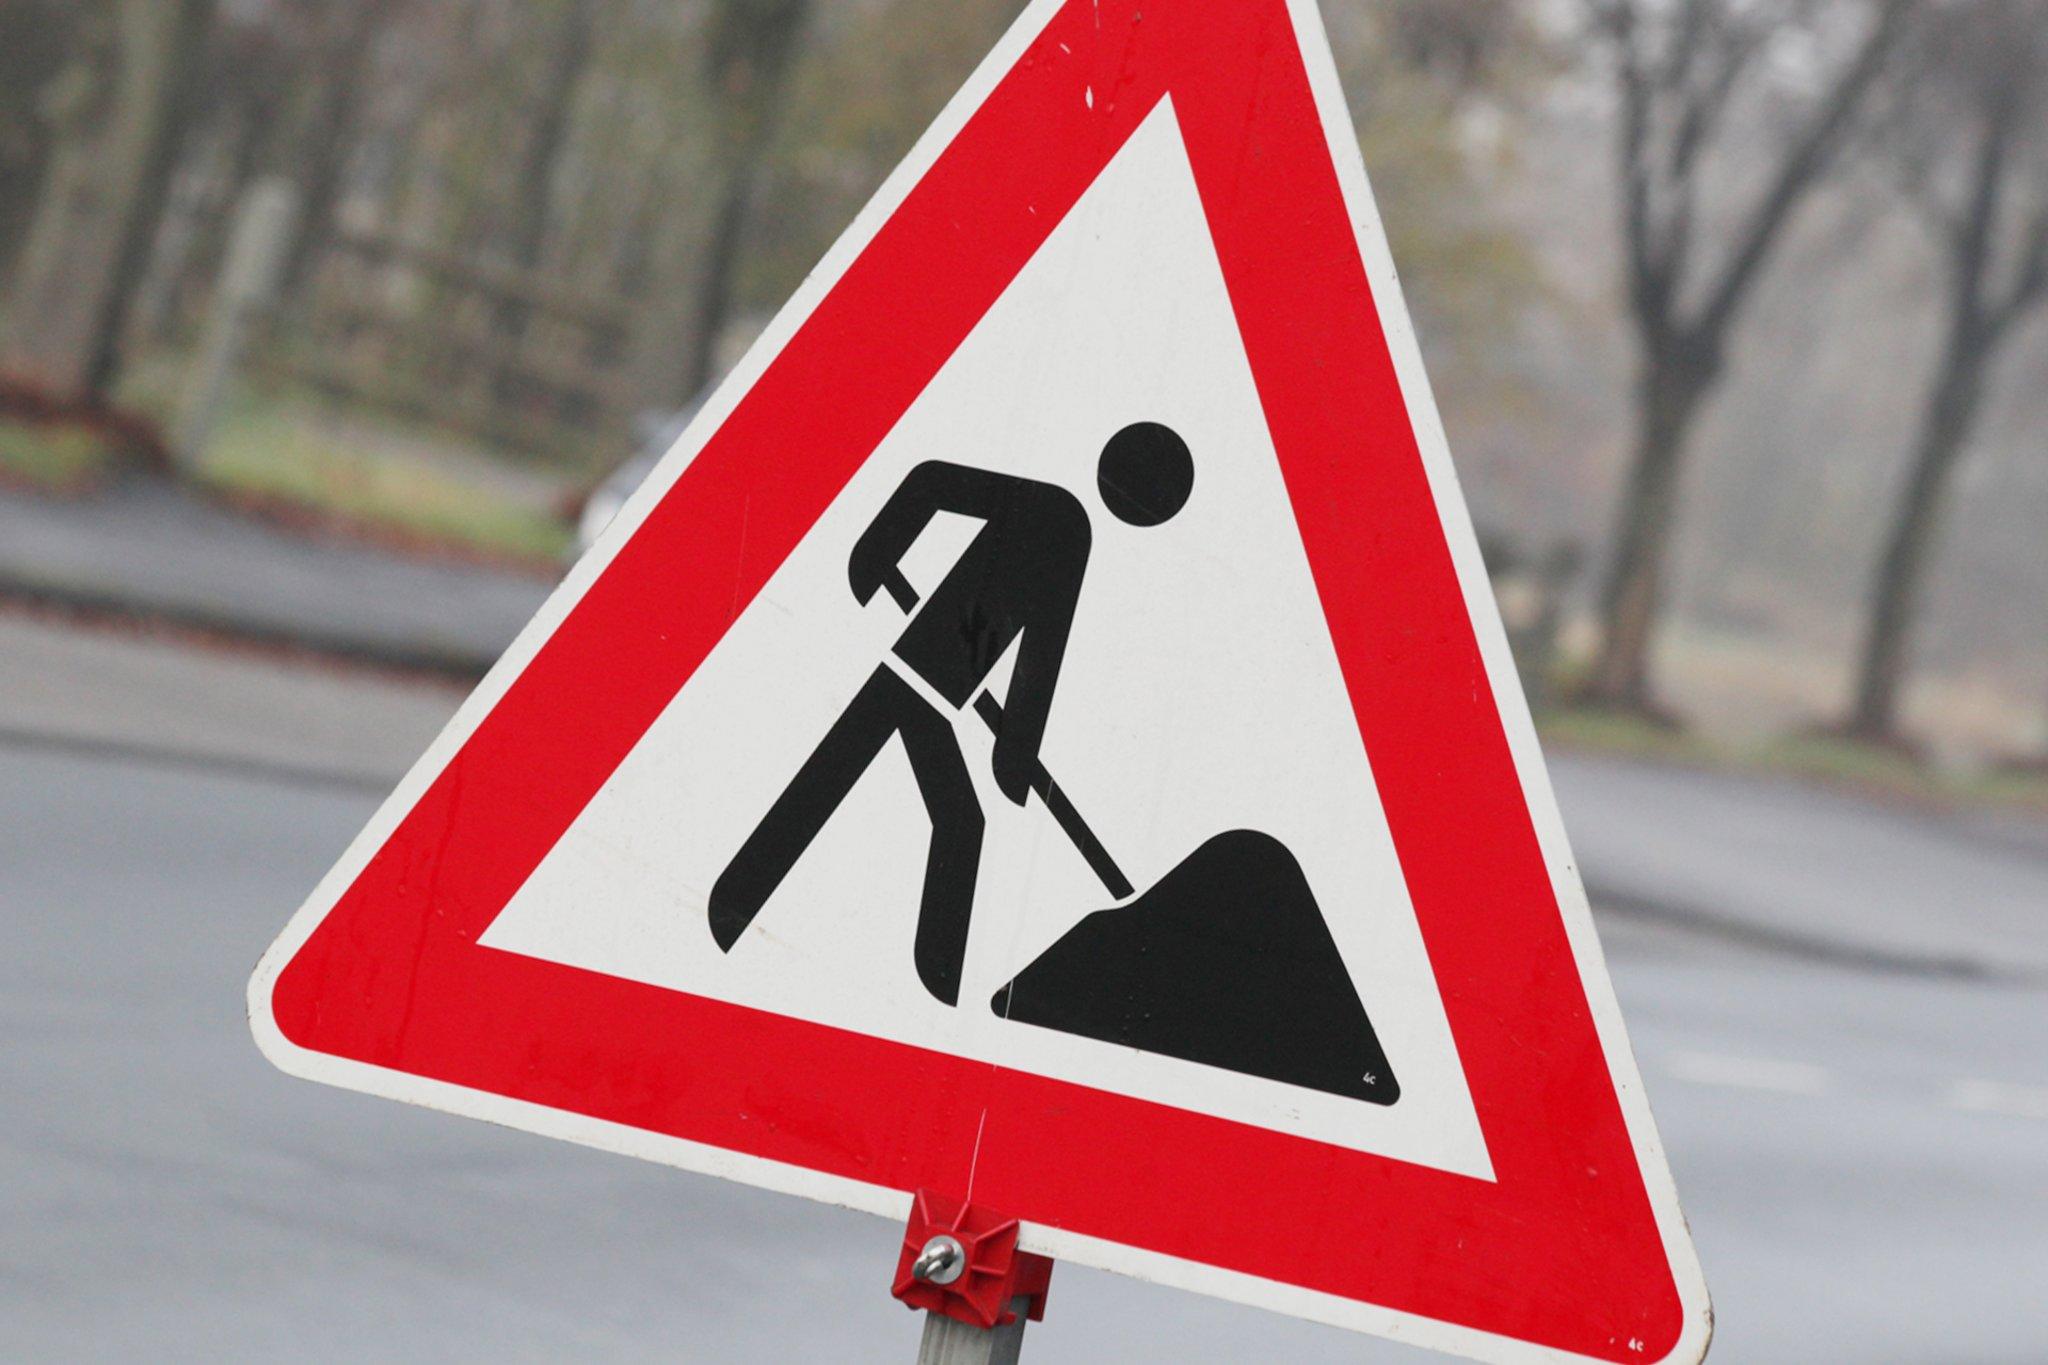 Akazienweg in Ennepetal wird morgen gesperrt -...